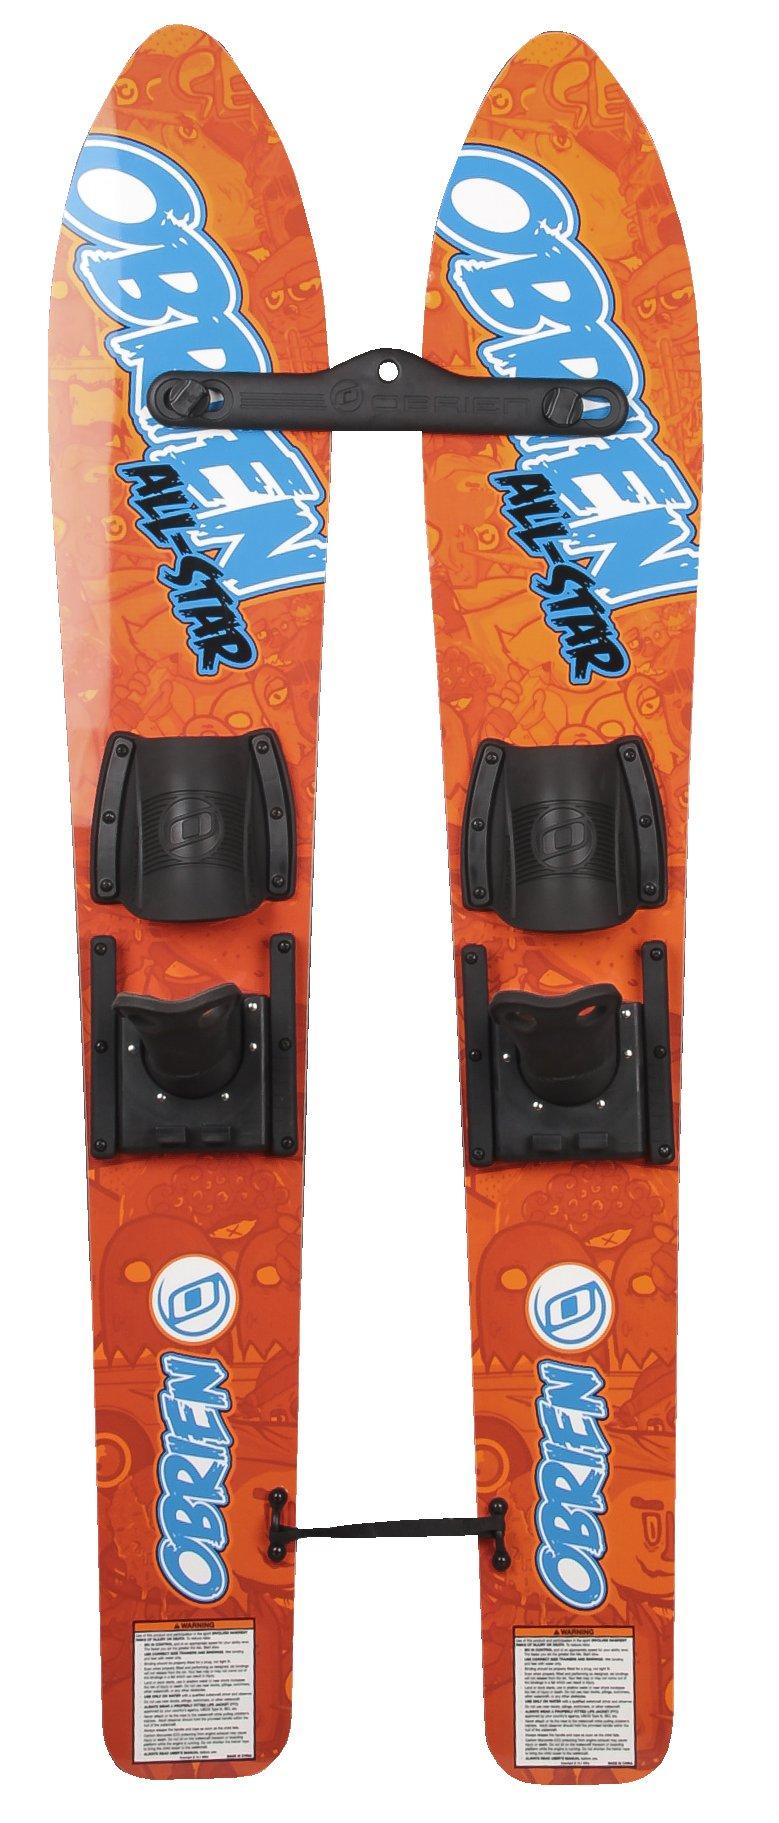 O'Brien All Star Jr. Trainer Water Skis, Orange, 46'' by O'Brien